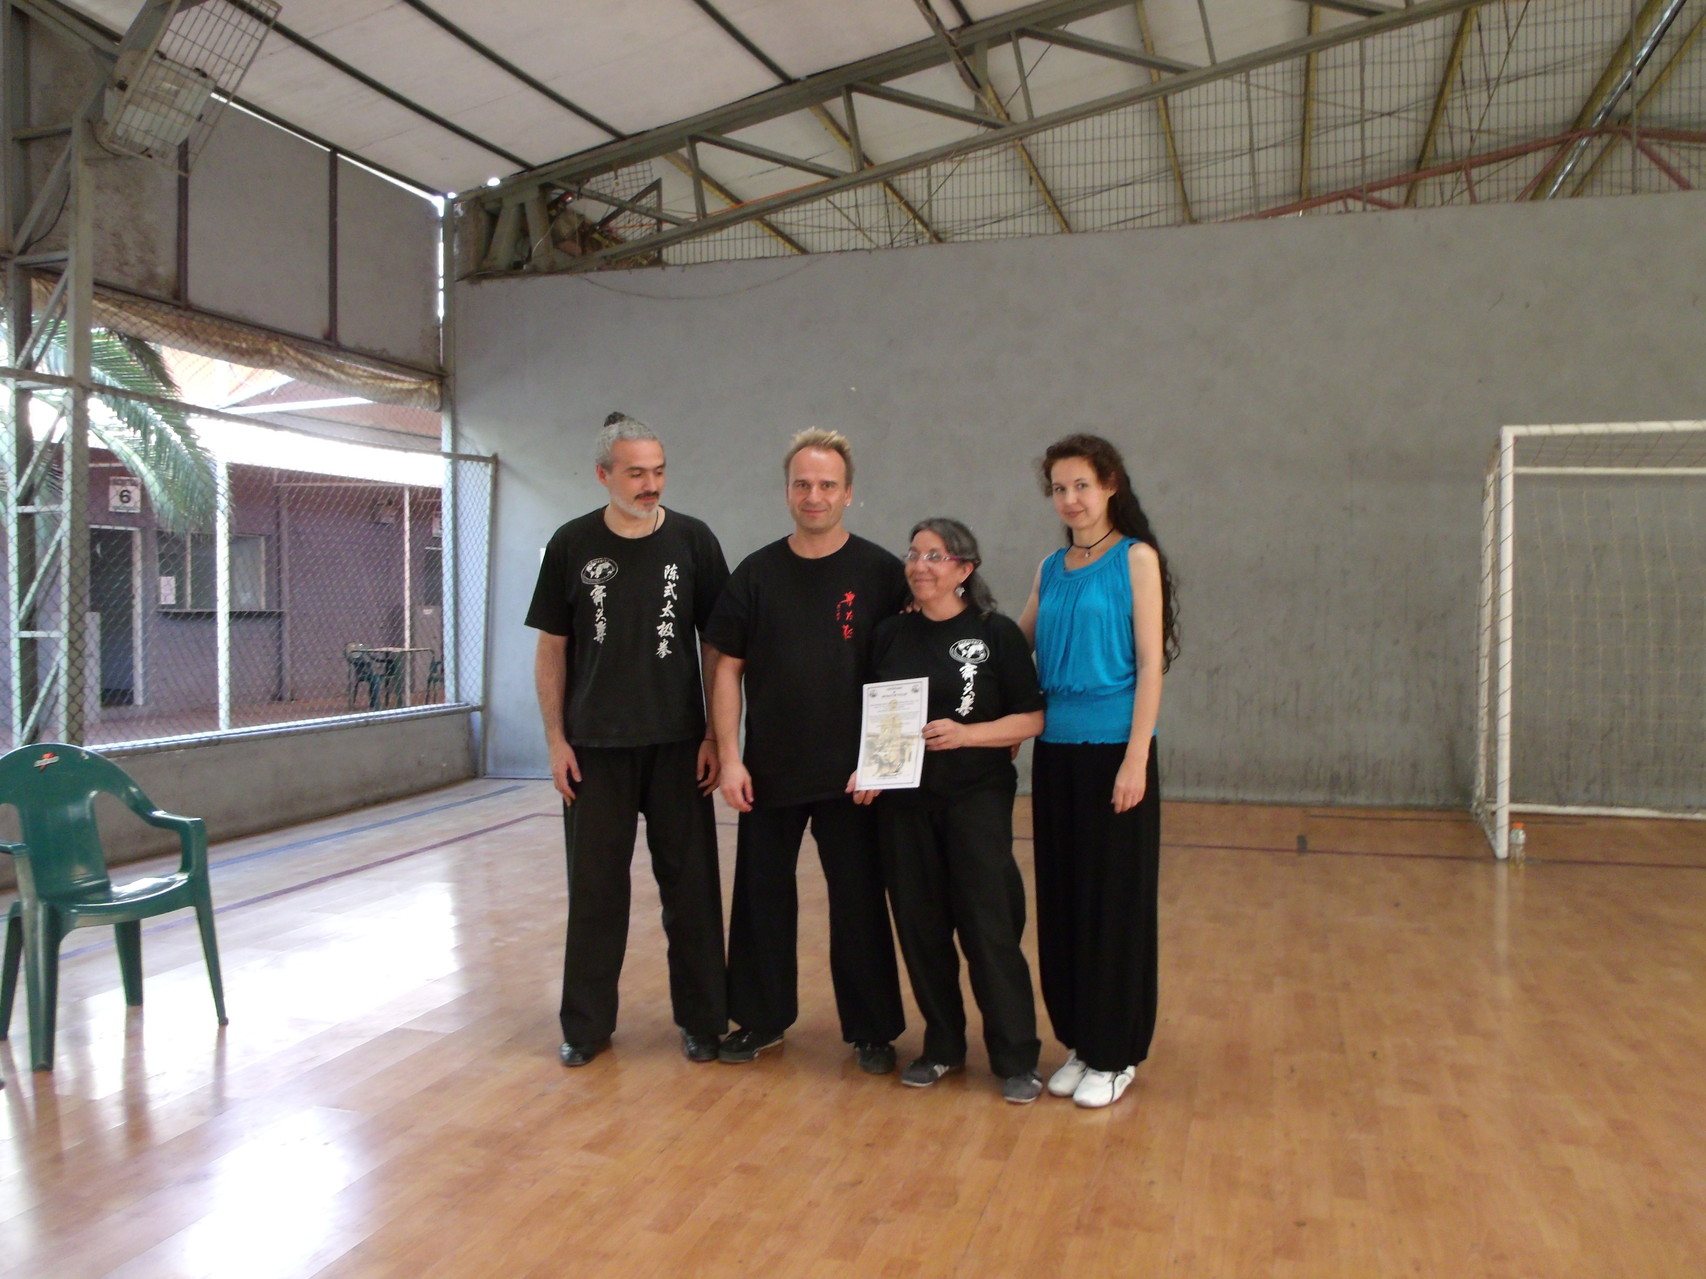 Instructora Certificada Nivel 2 con Master Jan Silberstorr, Miguel Sabaj, Celeste Ravanal (Instructores Formadores)